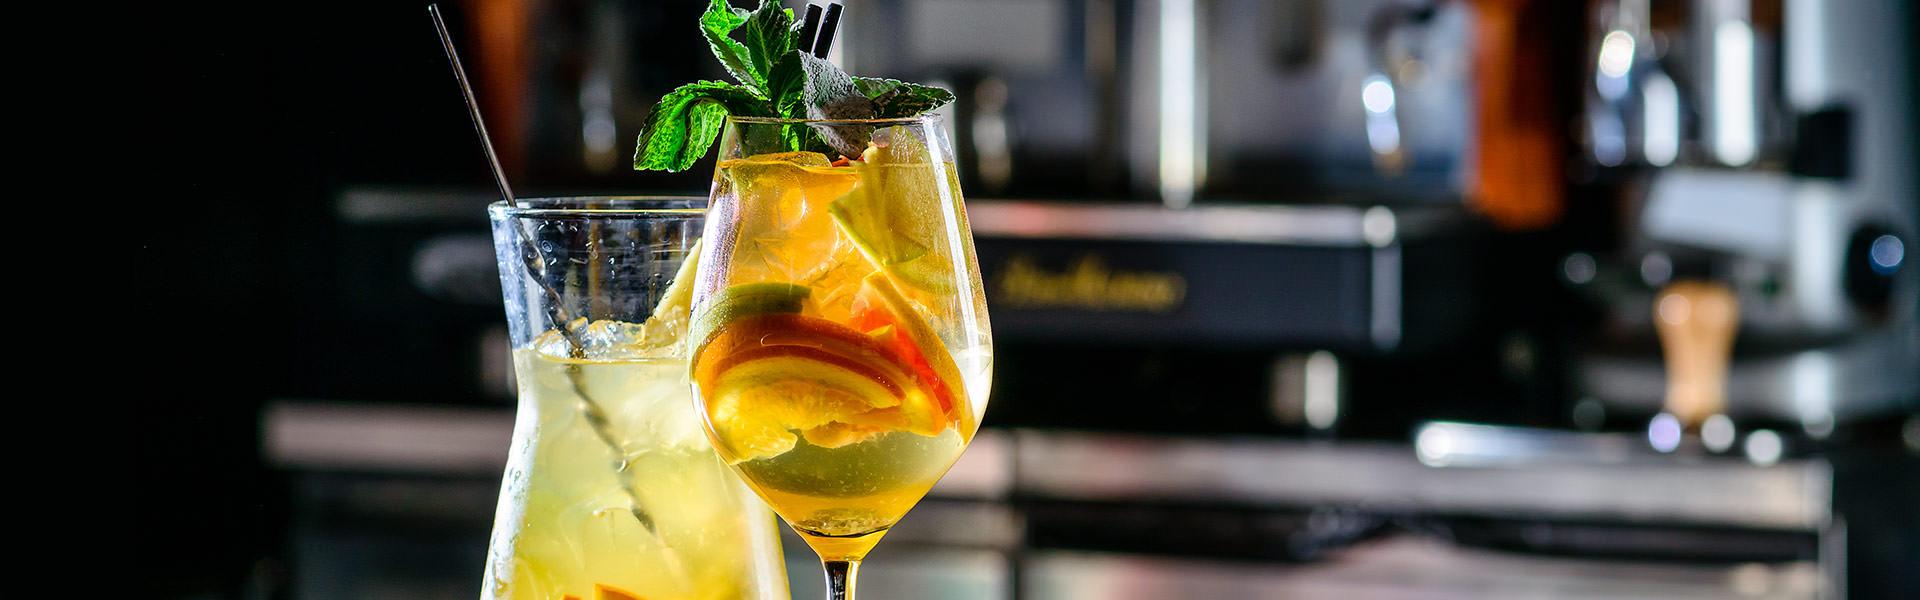 Cocktail Sangria Blanca